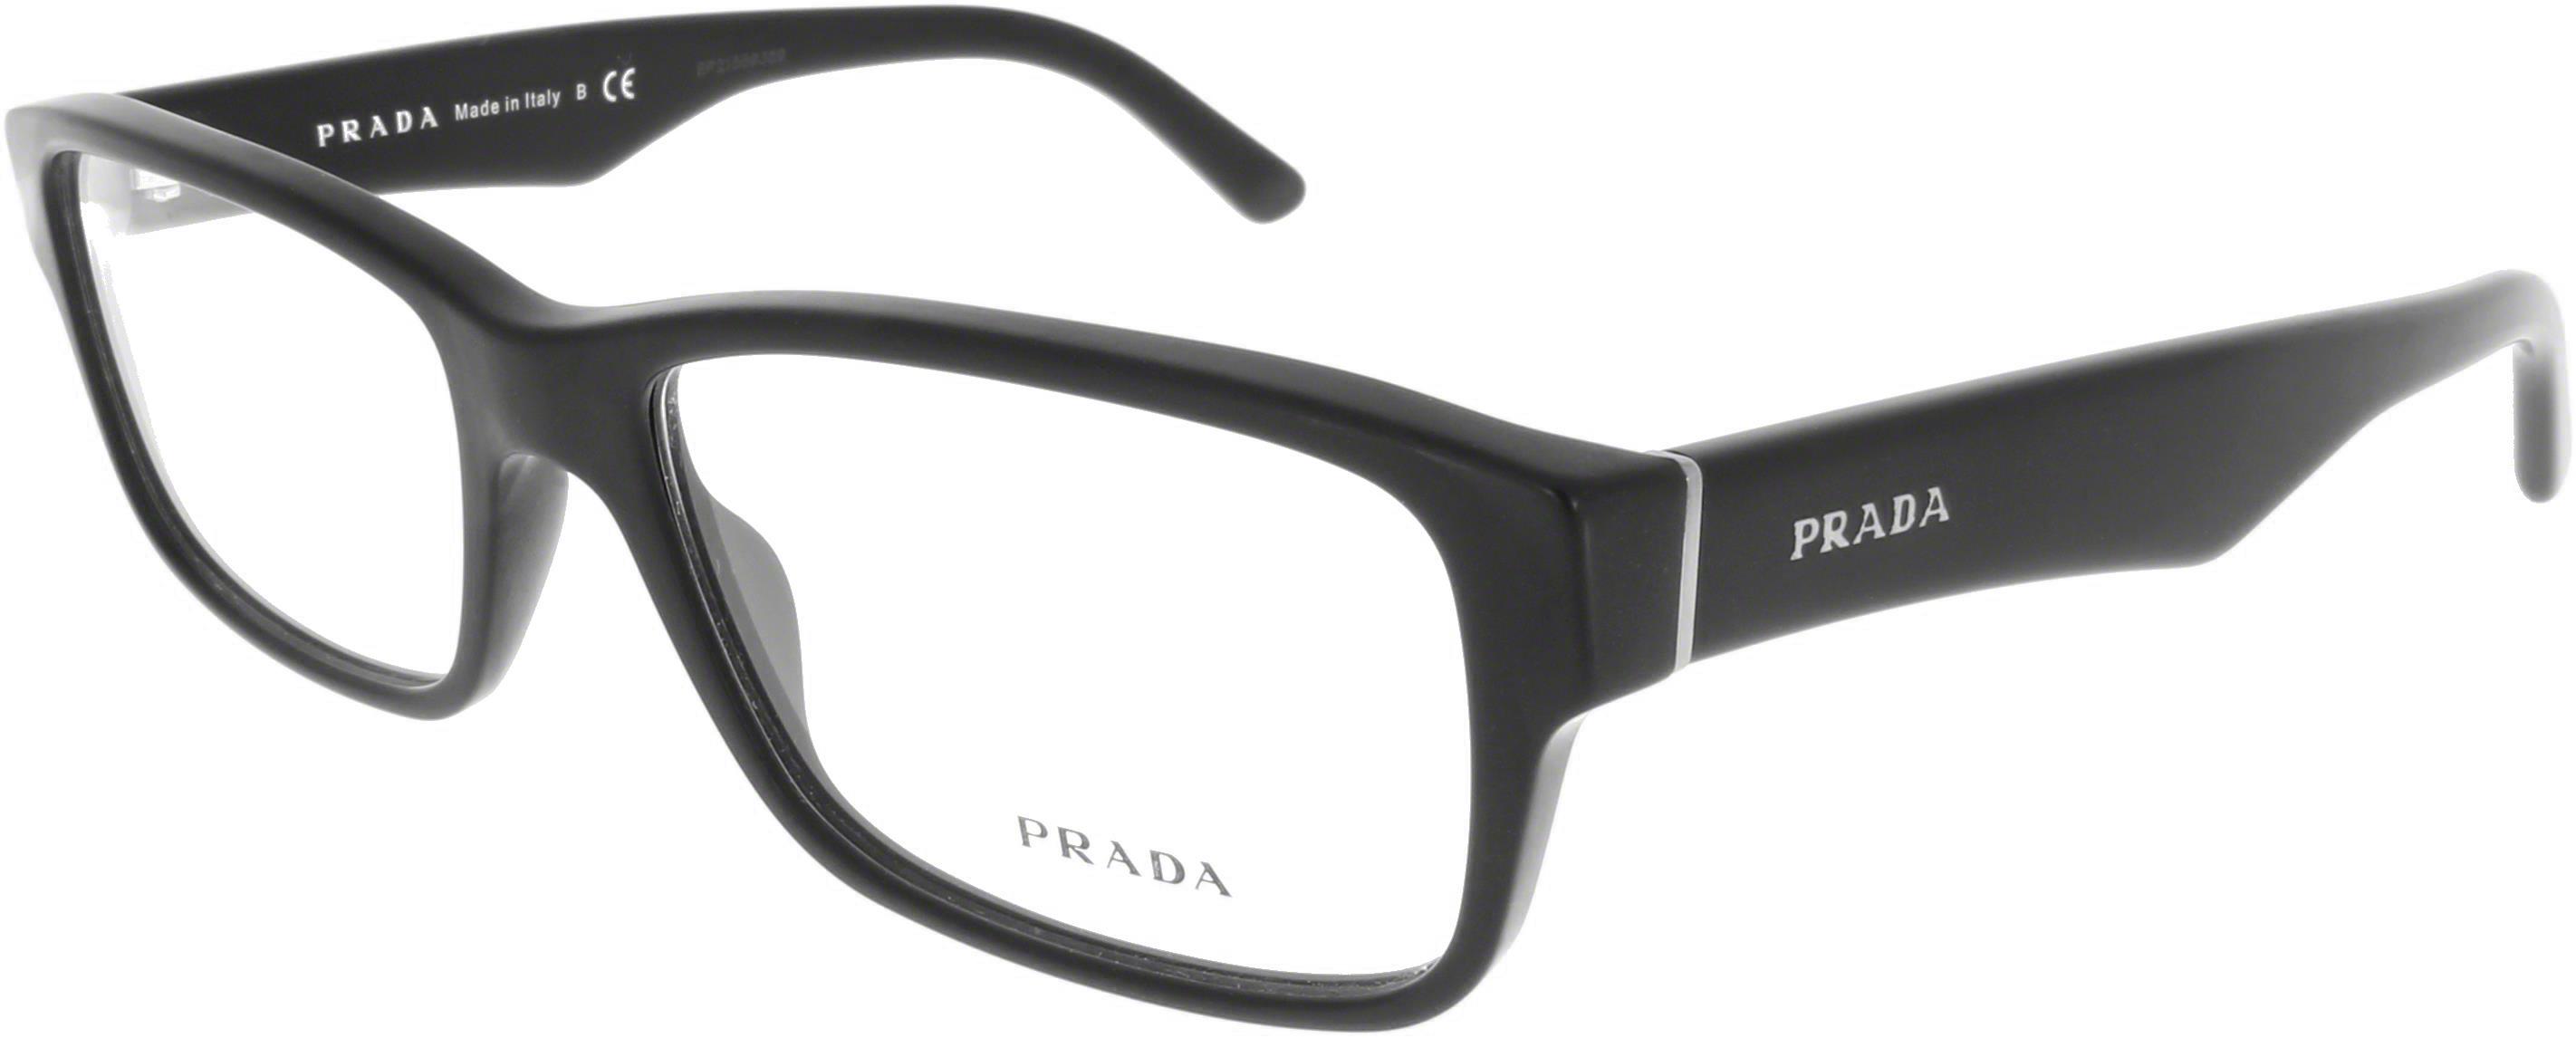 Prada schwarze Unisex Brille PR 16MC 1BO 55 n3u6IhF